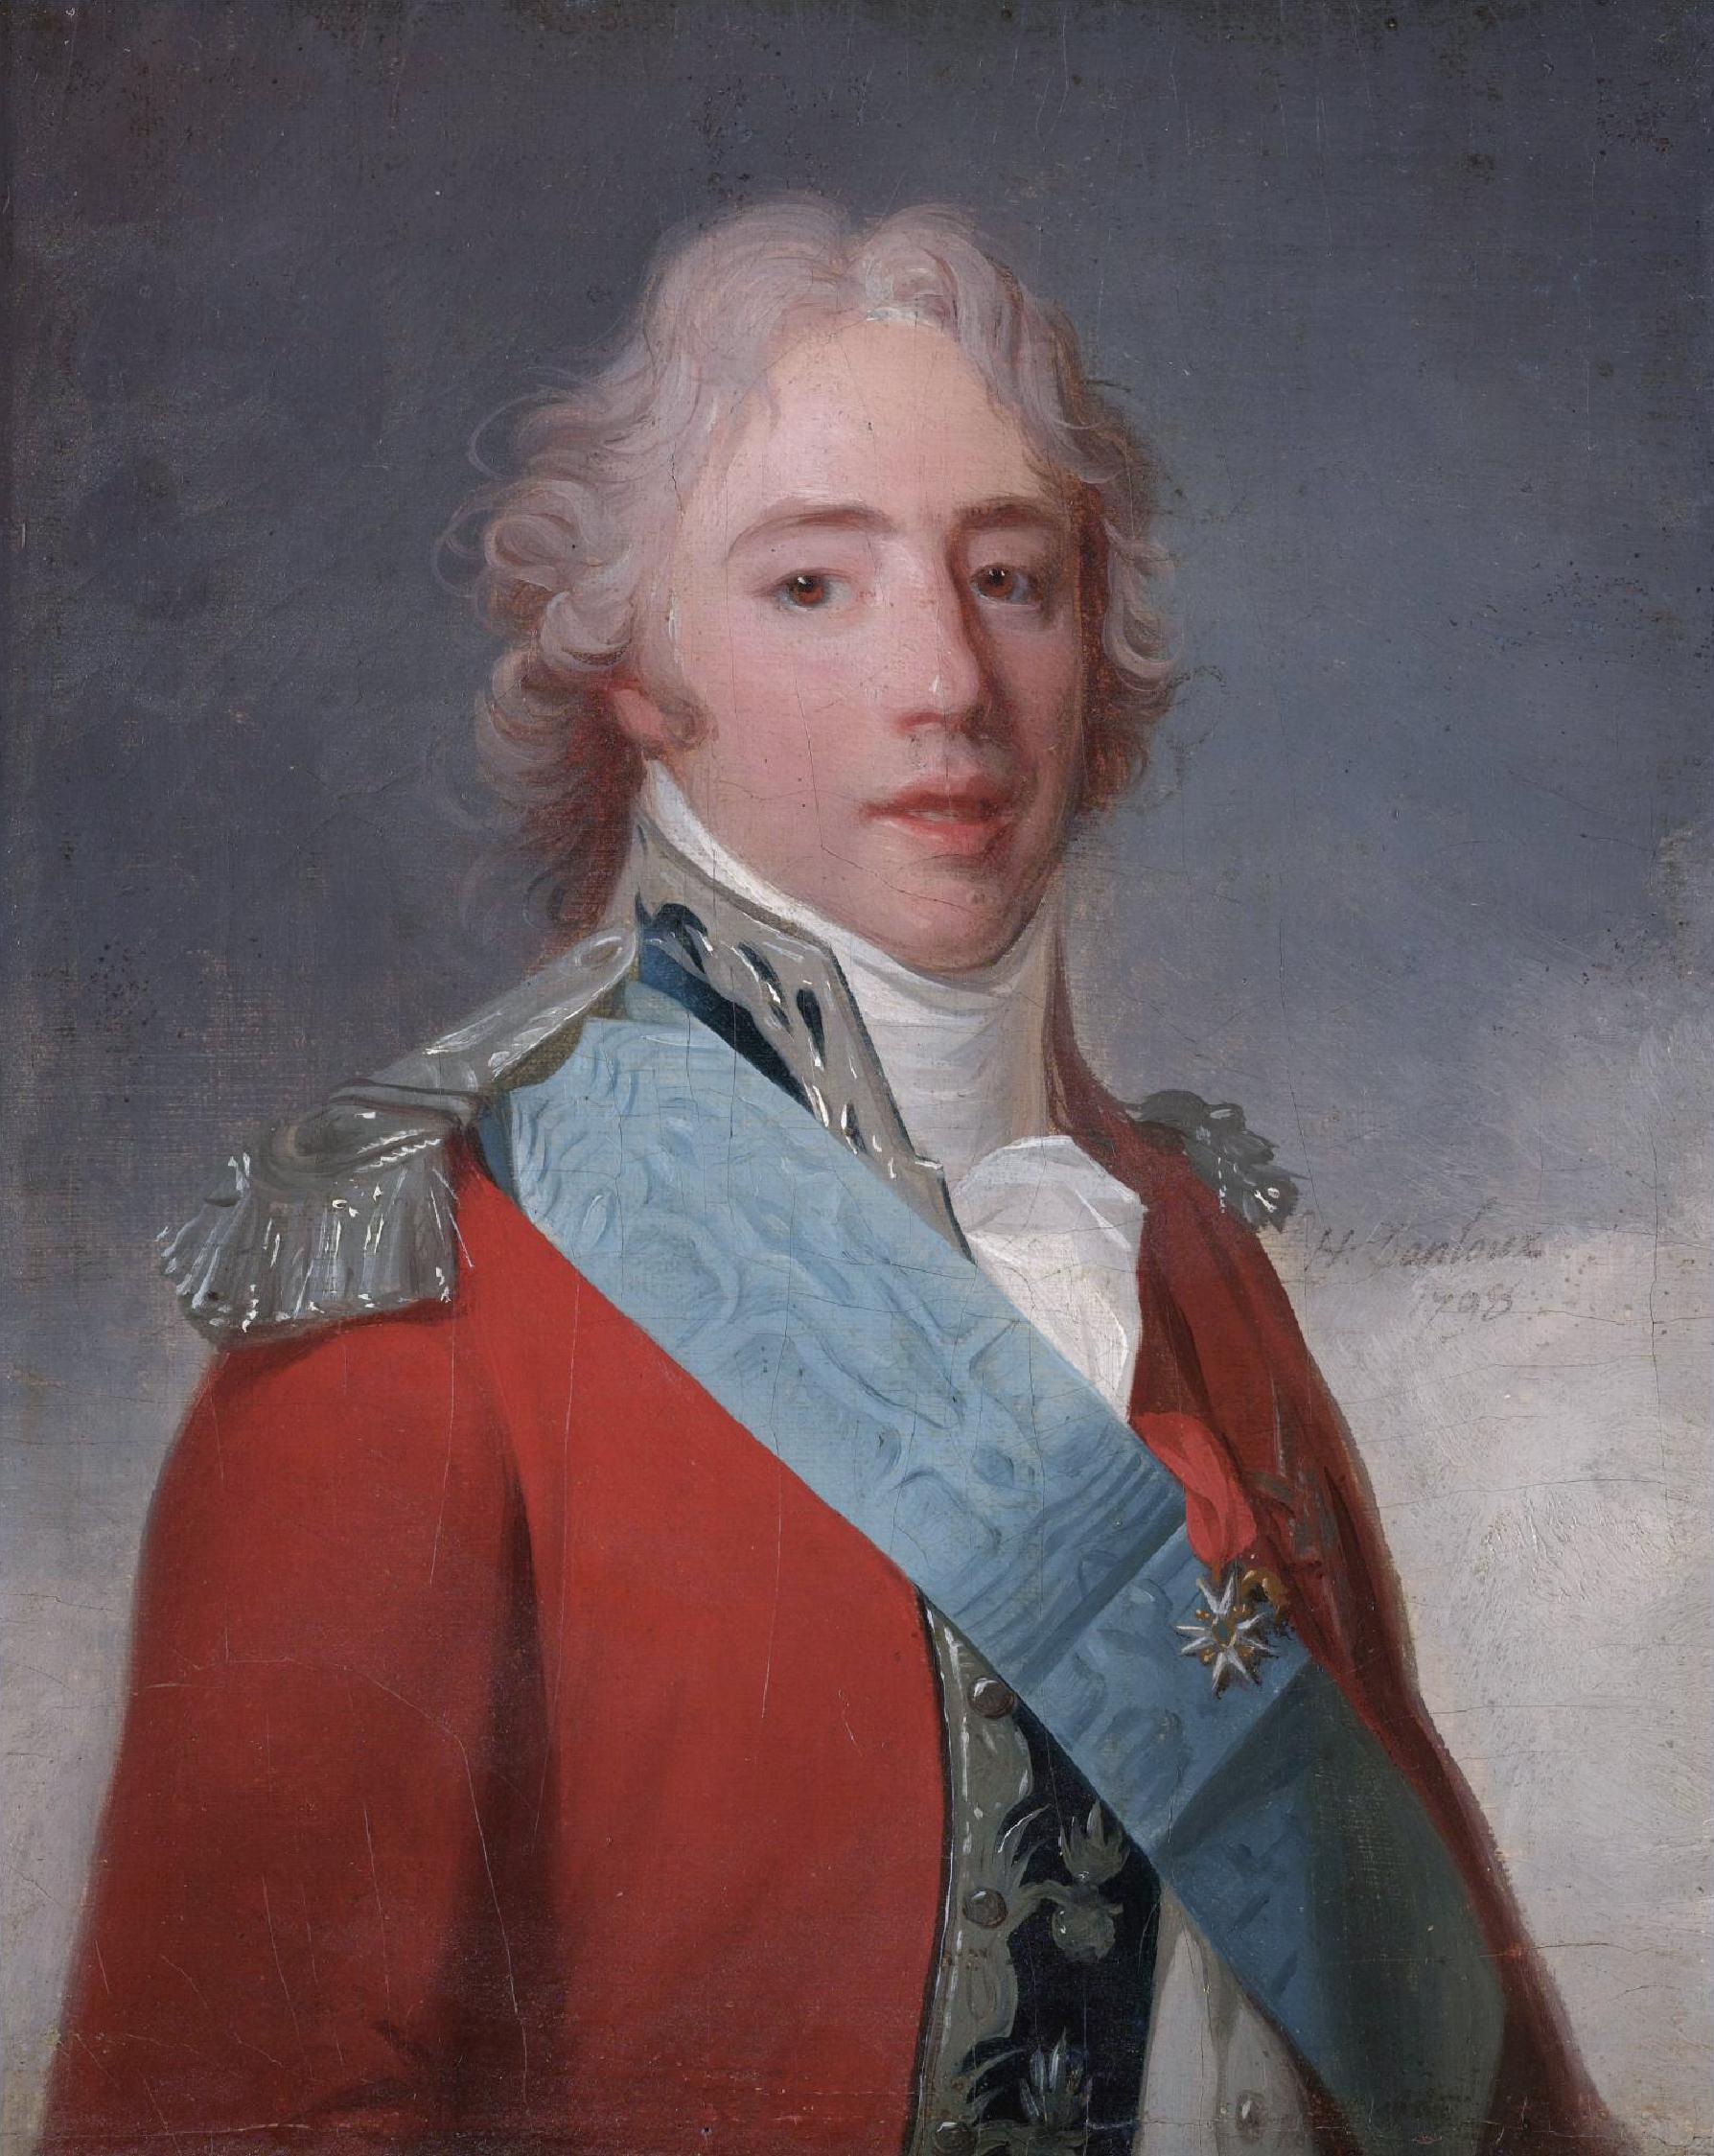 Fichier:Comte d'Artois, later Charles X of France, by Henri Pierre Danloux.jpg  — Wikipédia